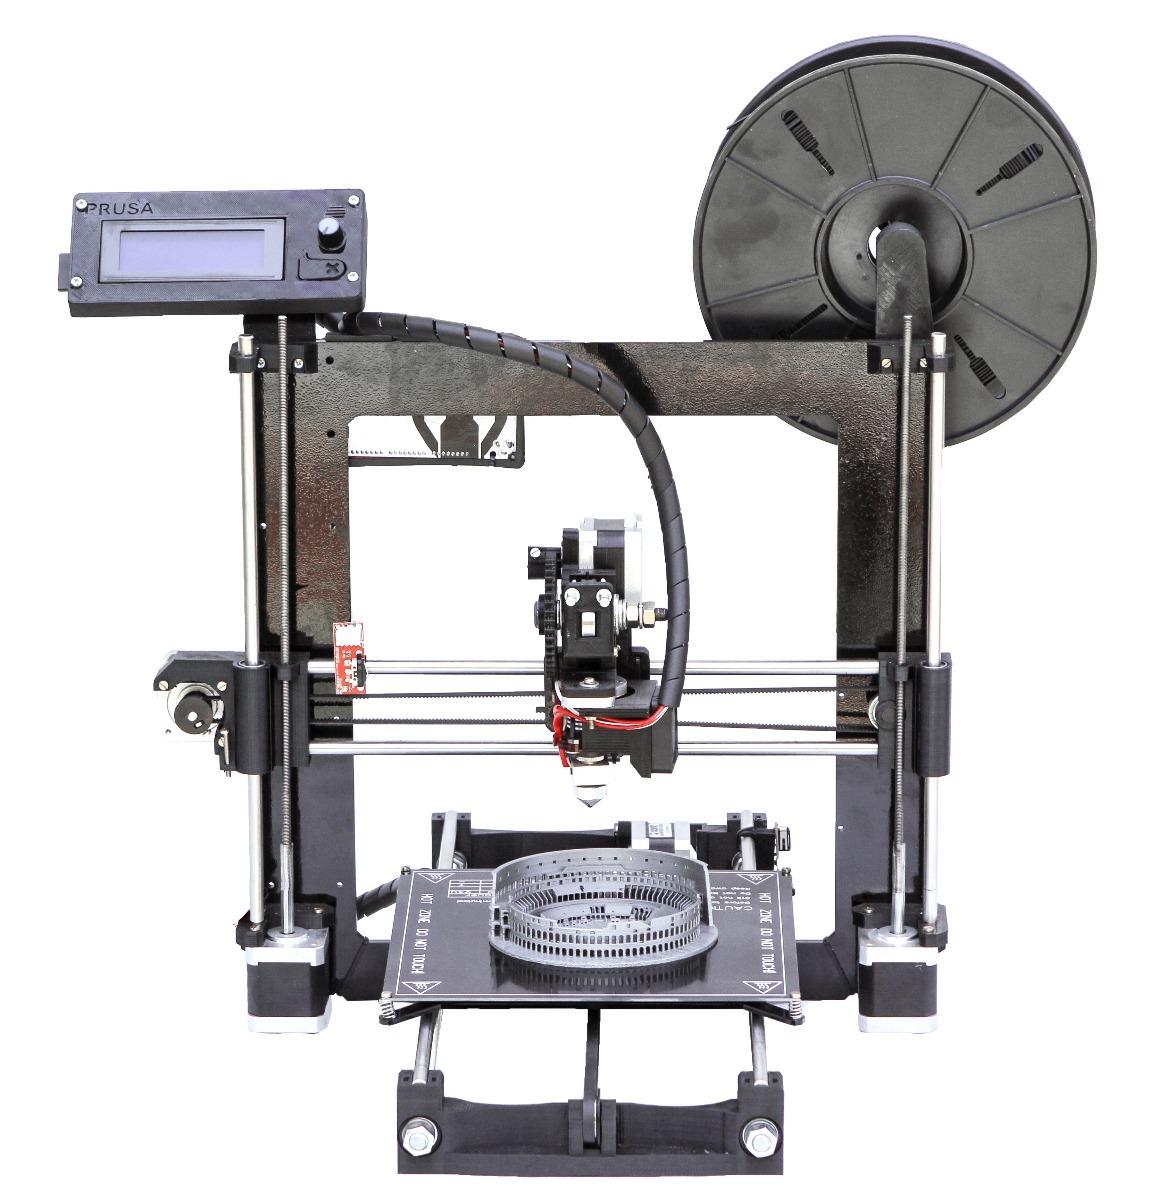 Kit Impresora 3d Prusa I3 Plus - Marco Acero 6mm + Cuotas ...